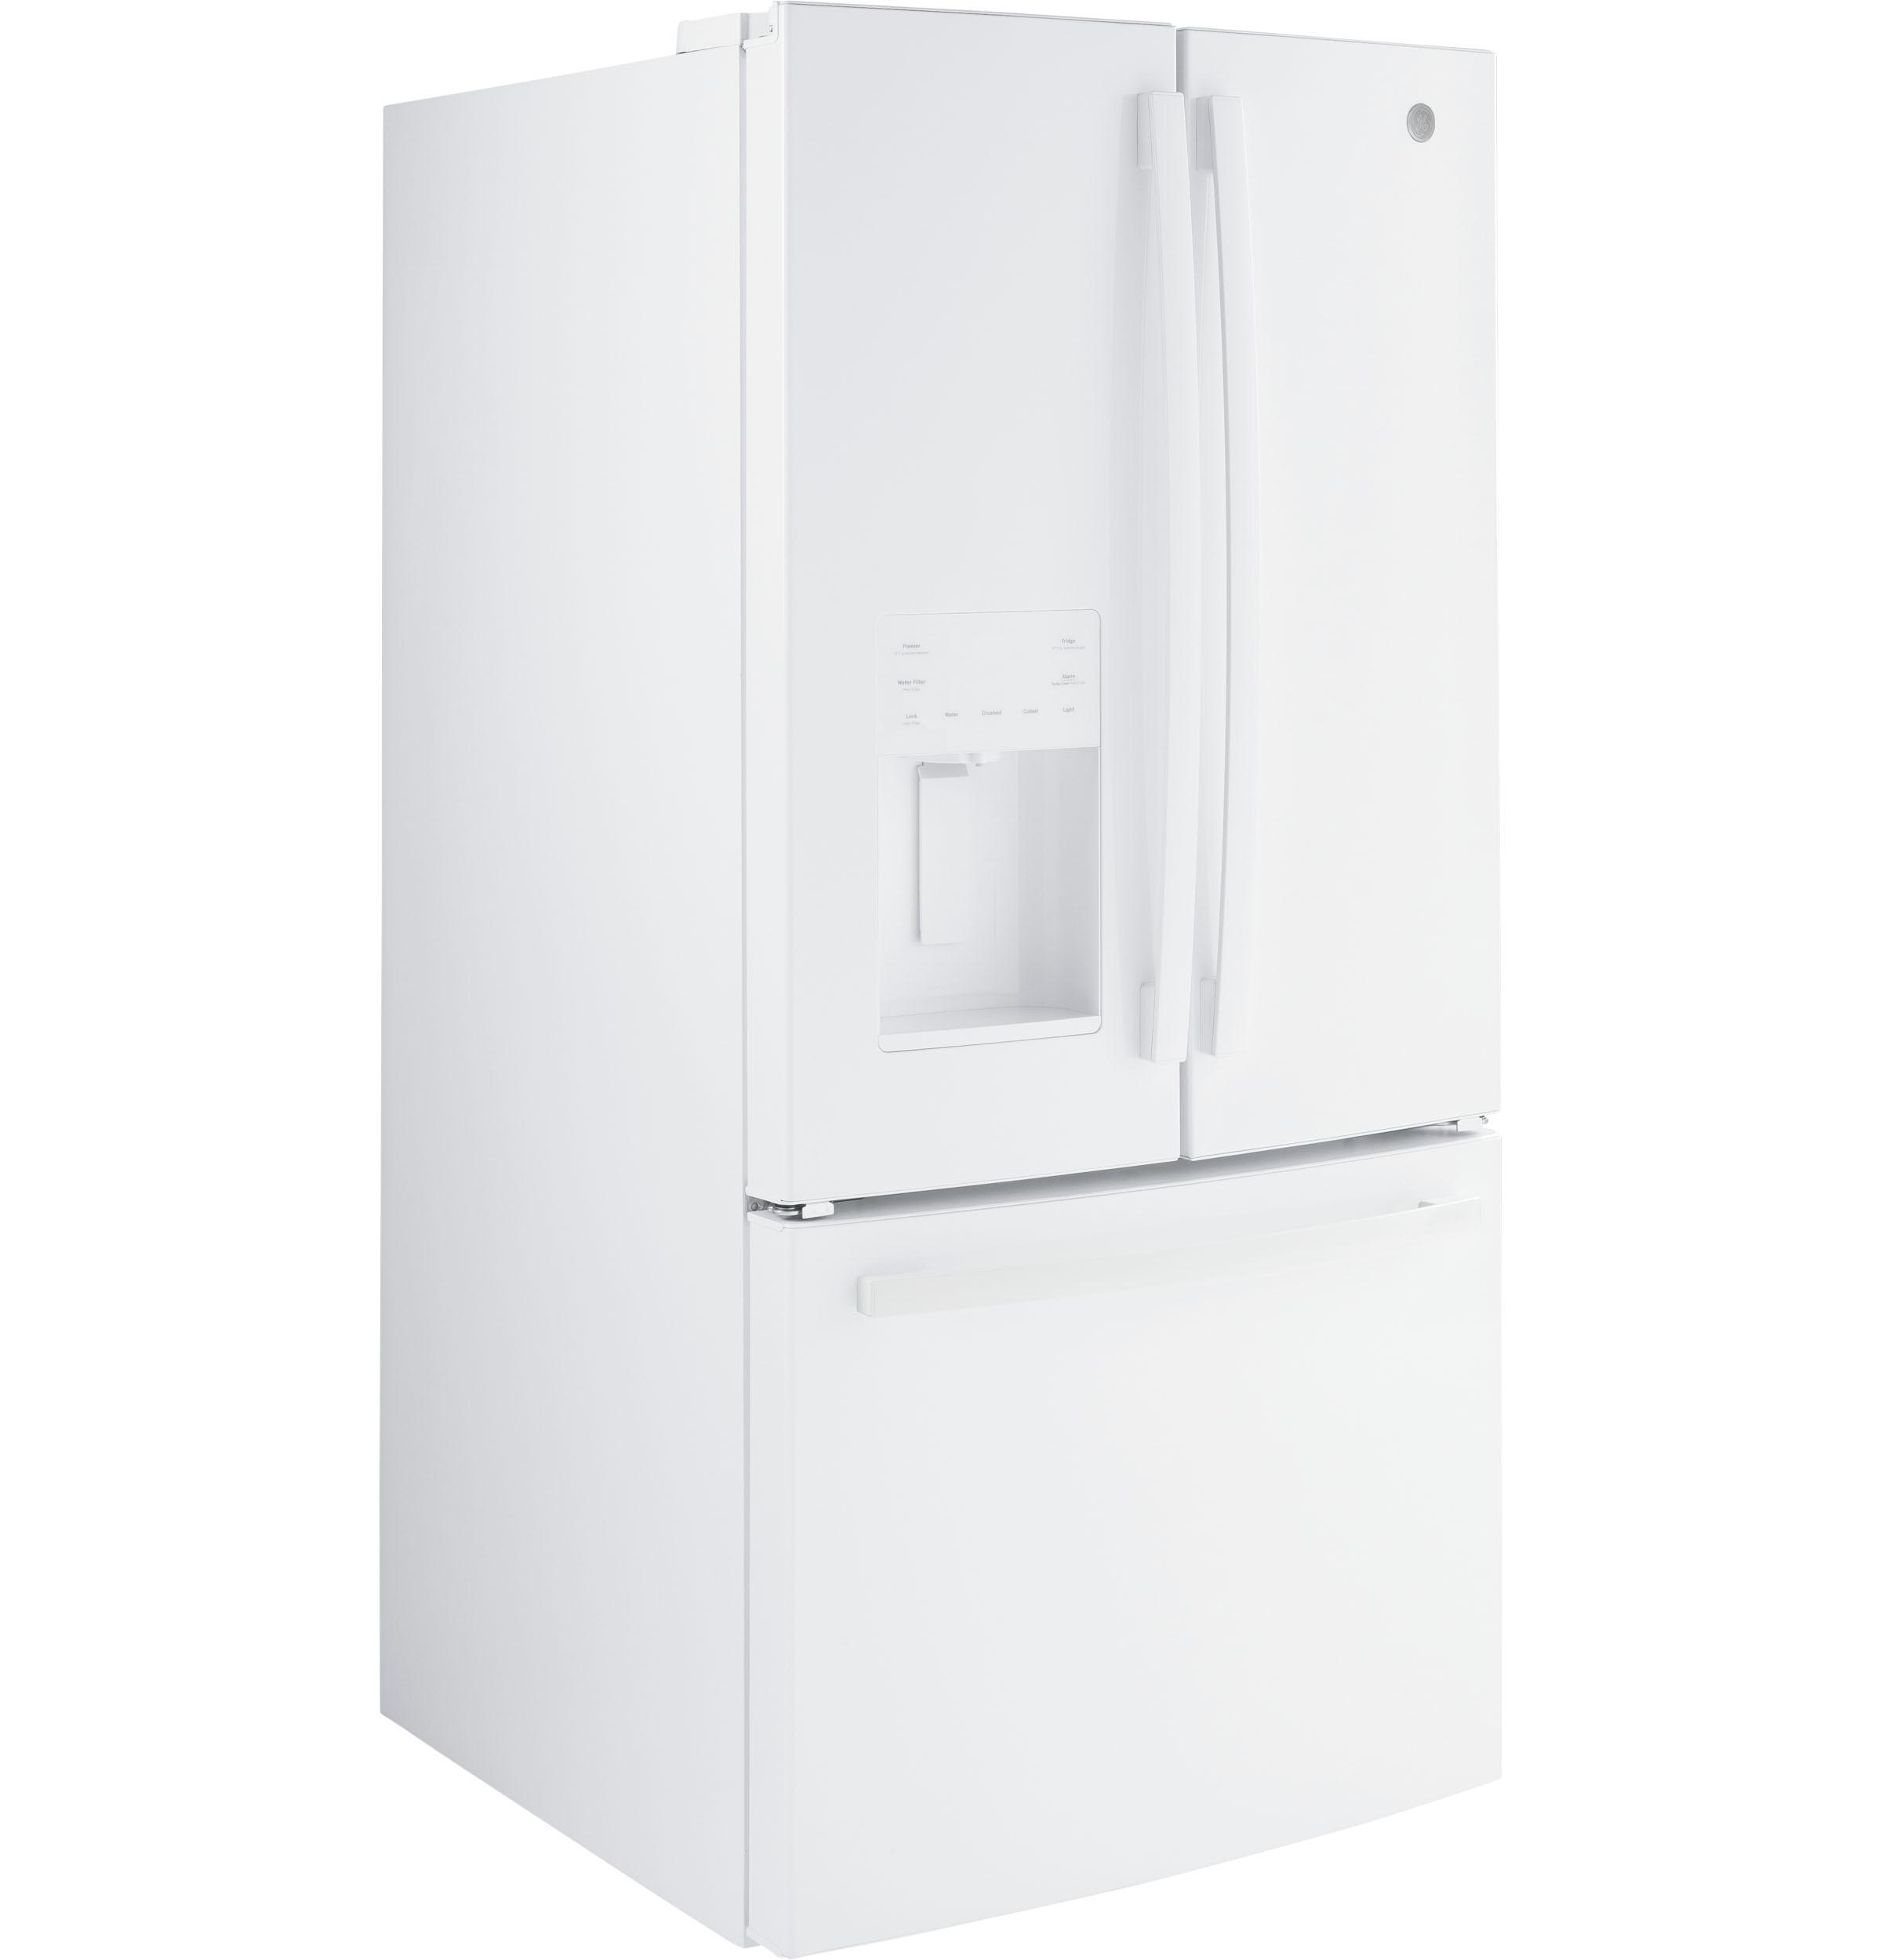 Model: GFE24JGKWW | GE GE® ENERGY STAR® 23.6 Cu. Ft. French-Door Refrigerator